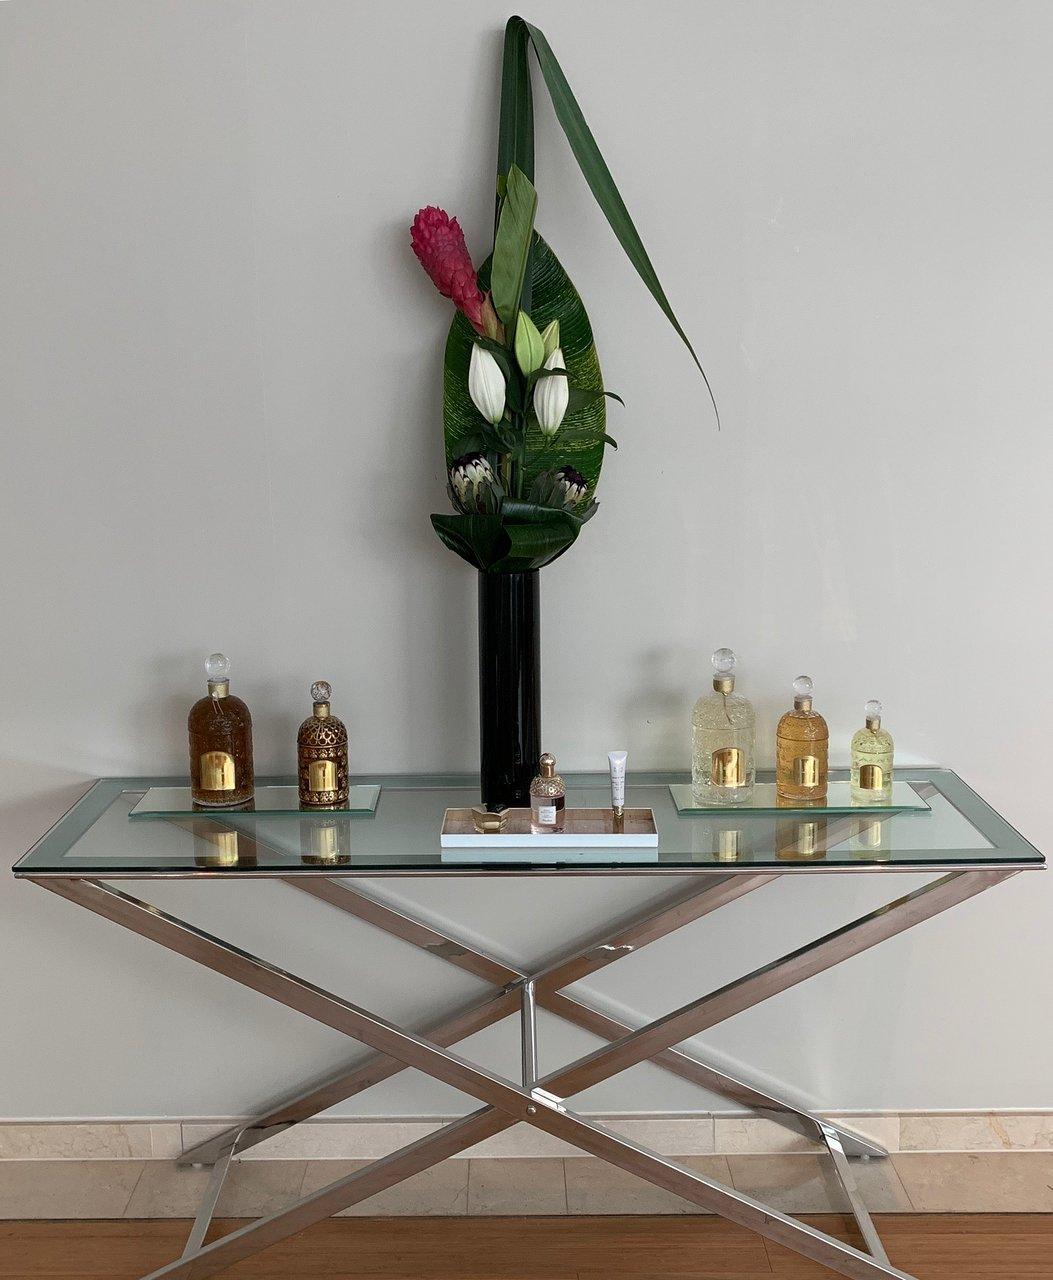 Table Jardin Aluminium Nouveau Spa Guerlain ВерсаРь Ручшие советы перед посещением Of 29 Inspirant Table Jardin Aluminium